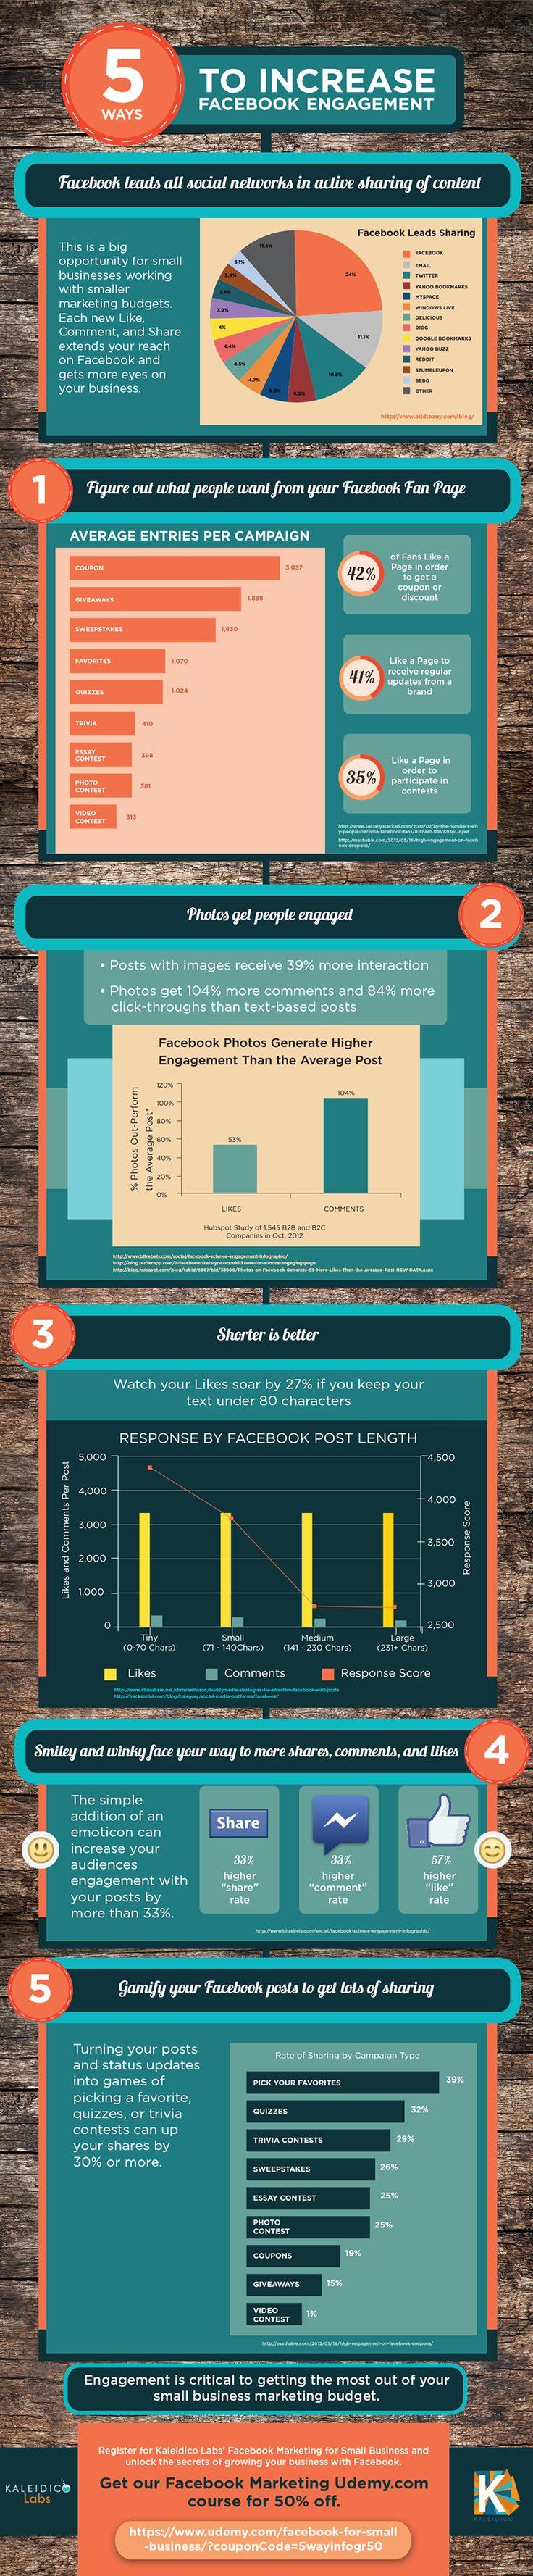 5 Tips to increase Facebook Engagement #infografia #infographic #socialmedia